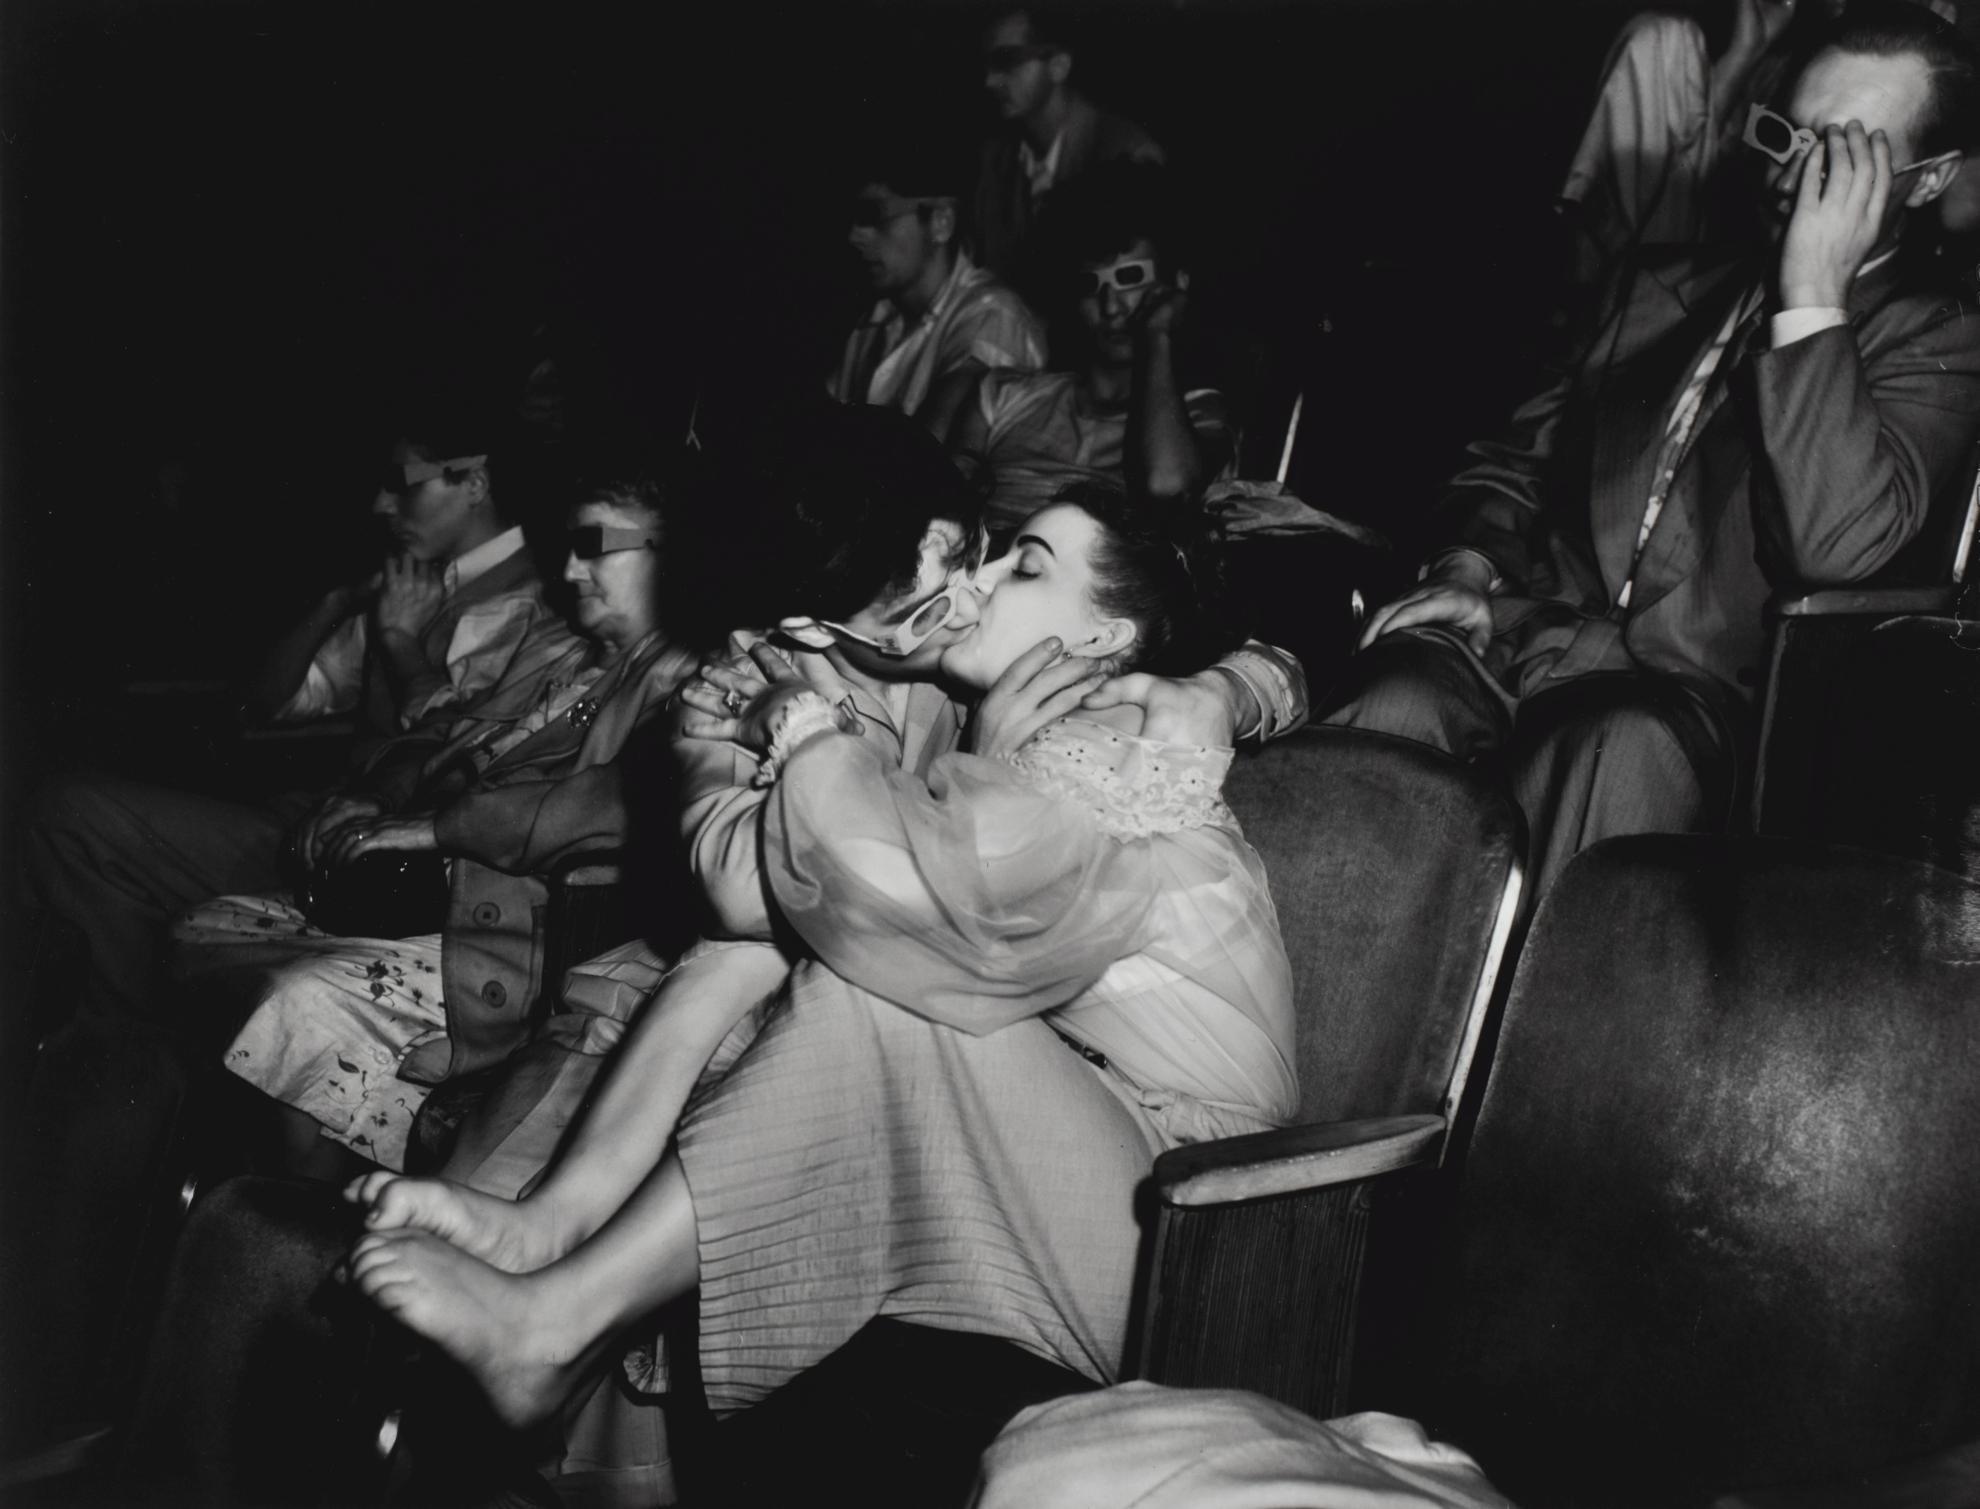 Weegee-Weegee Portfolio (Portfolio Of 45 Photographs)-1986